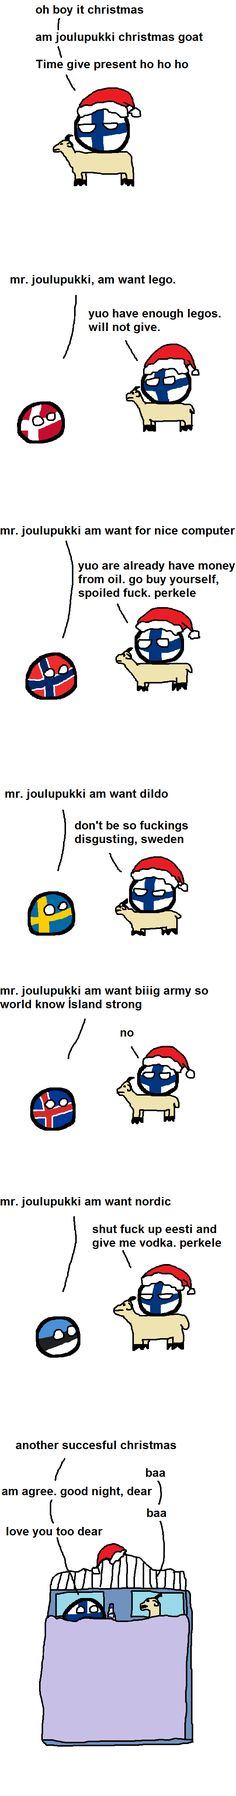 Christmas is Finnished (Finland, Denmark, Norway, Sweden, Iceland, Estonia) by Eesti Stronk #polandball #countryball